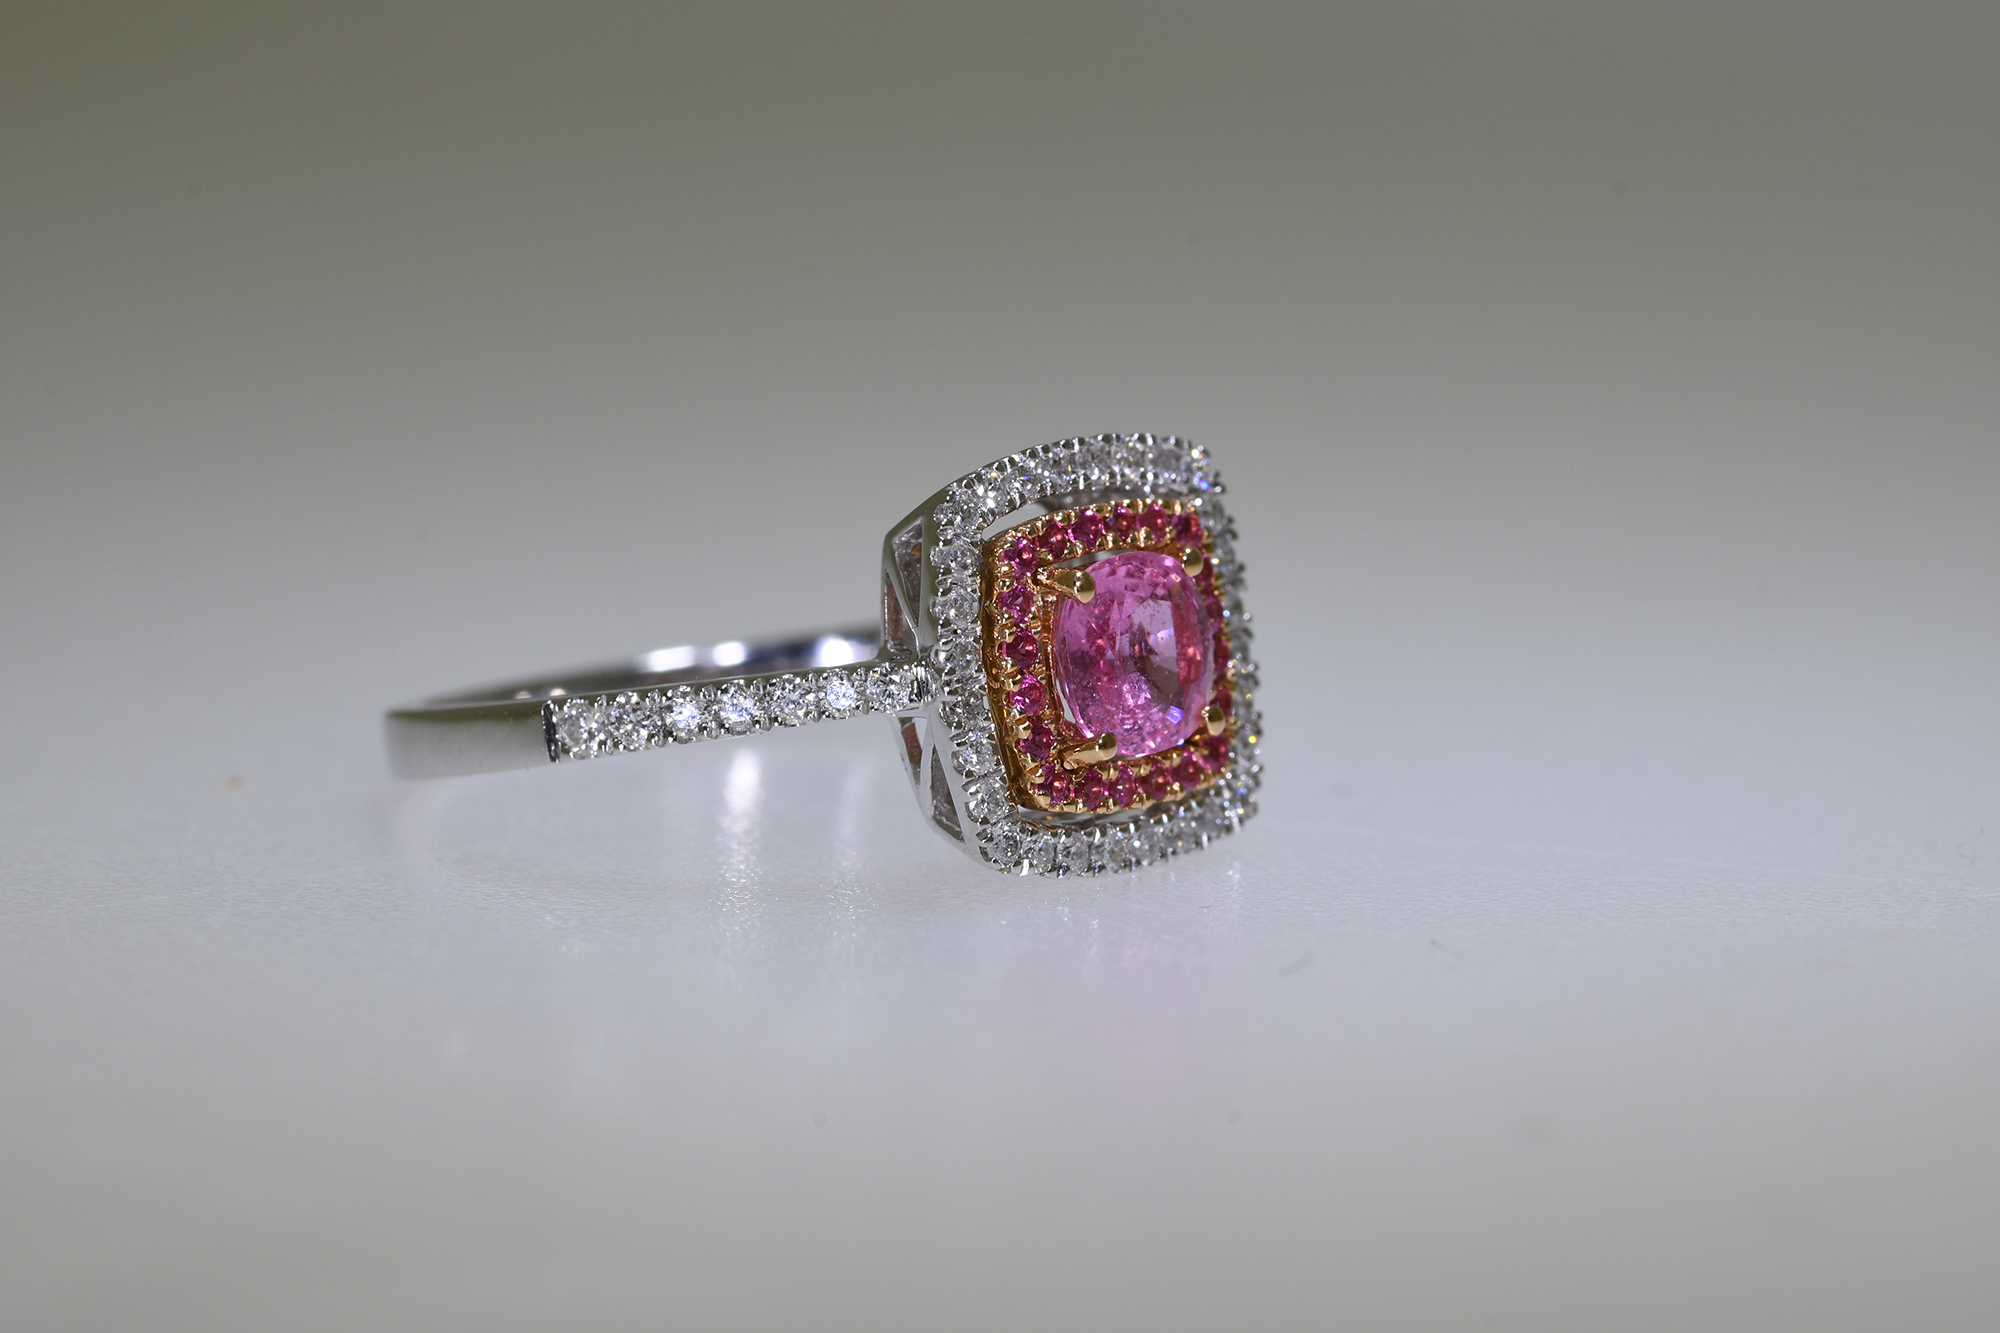 Pink Sapphire & Diamond Ring - Image 2 of 2